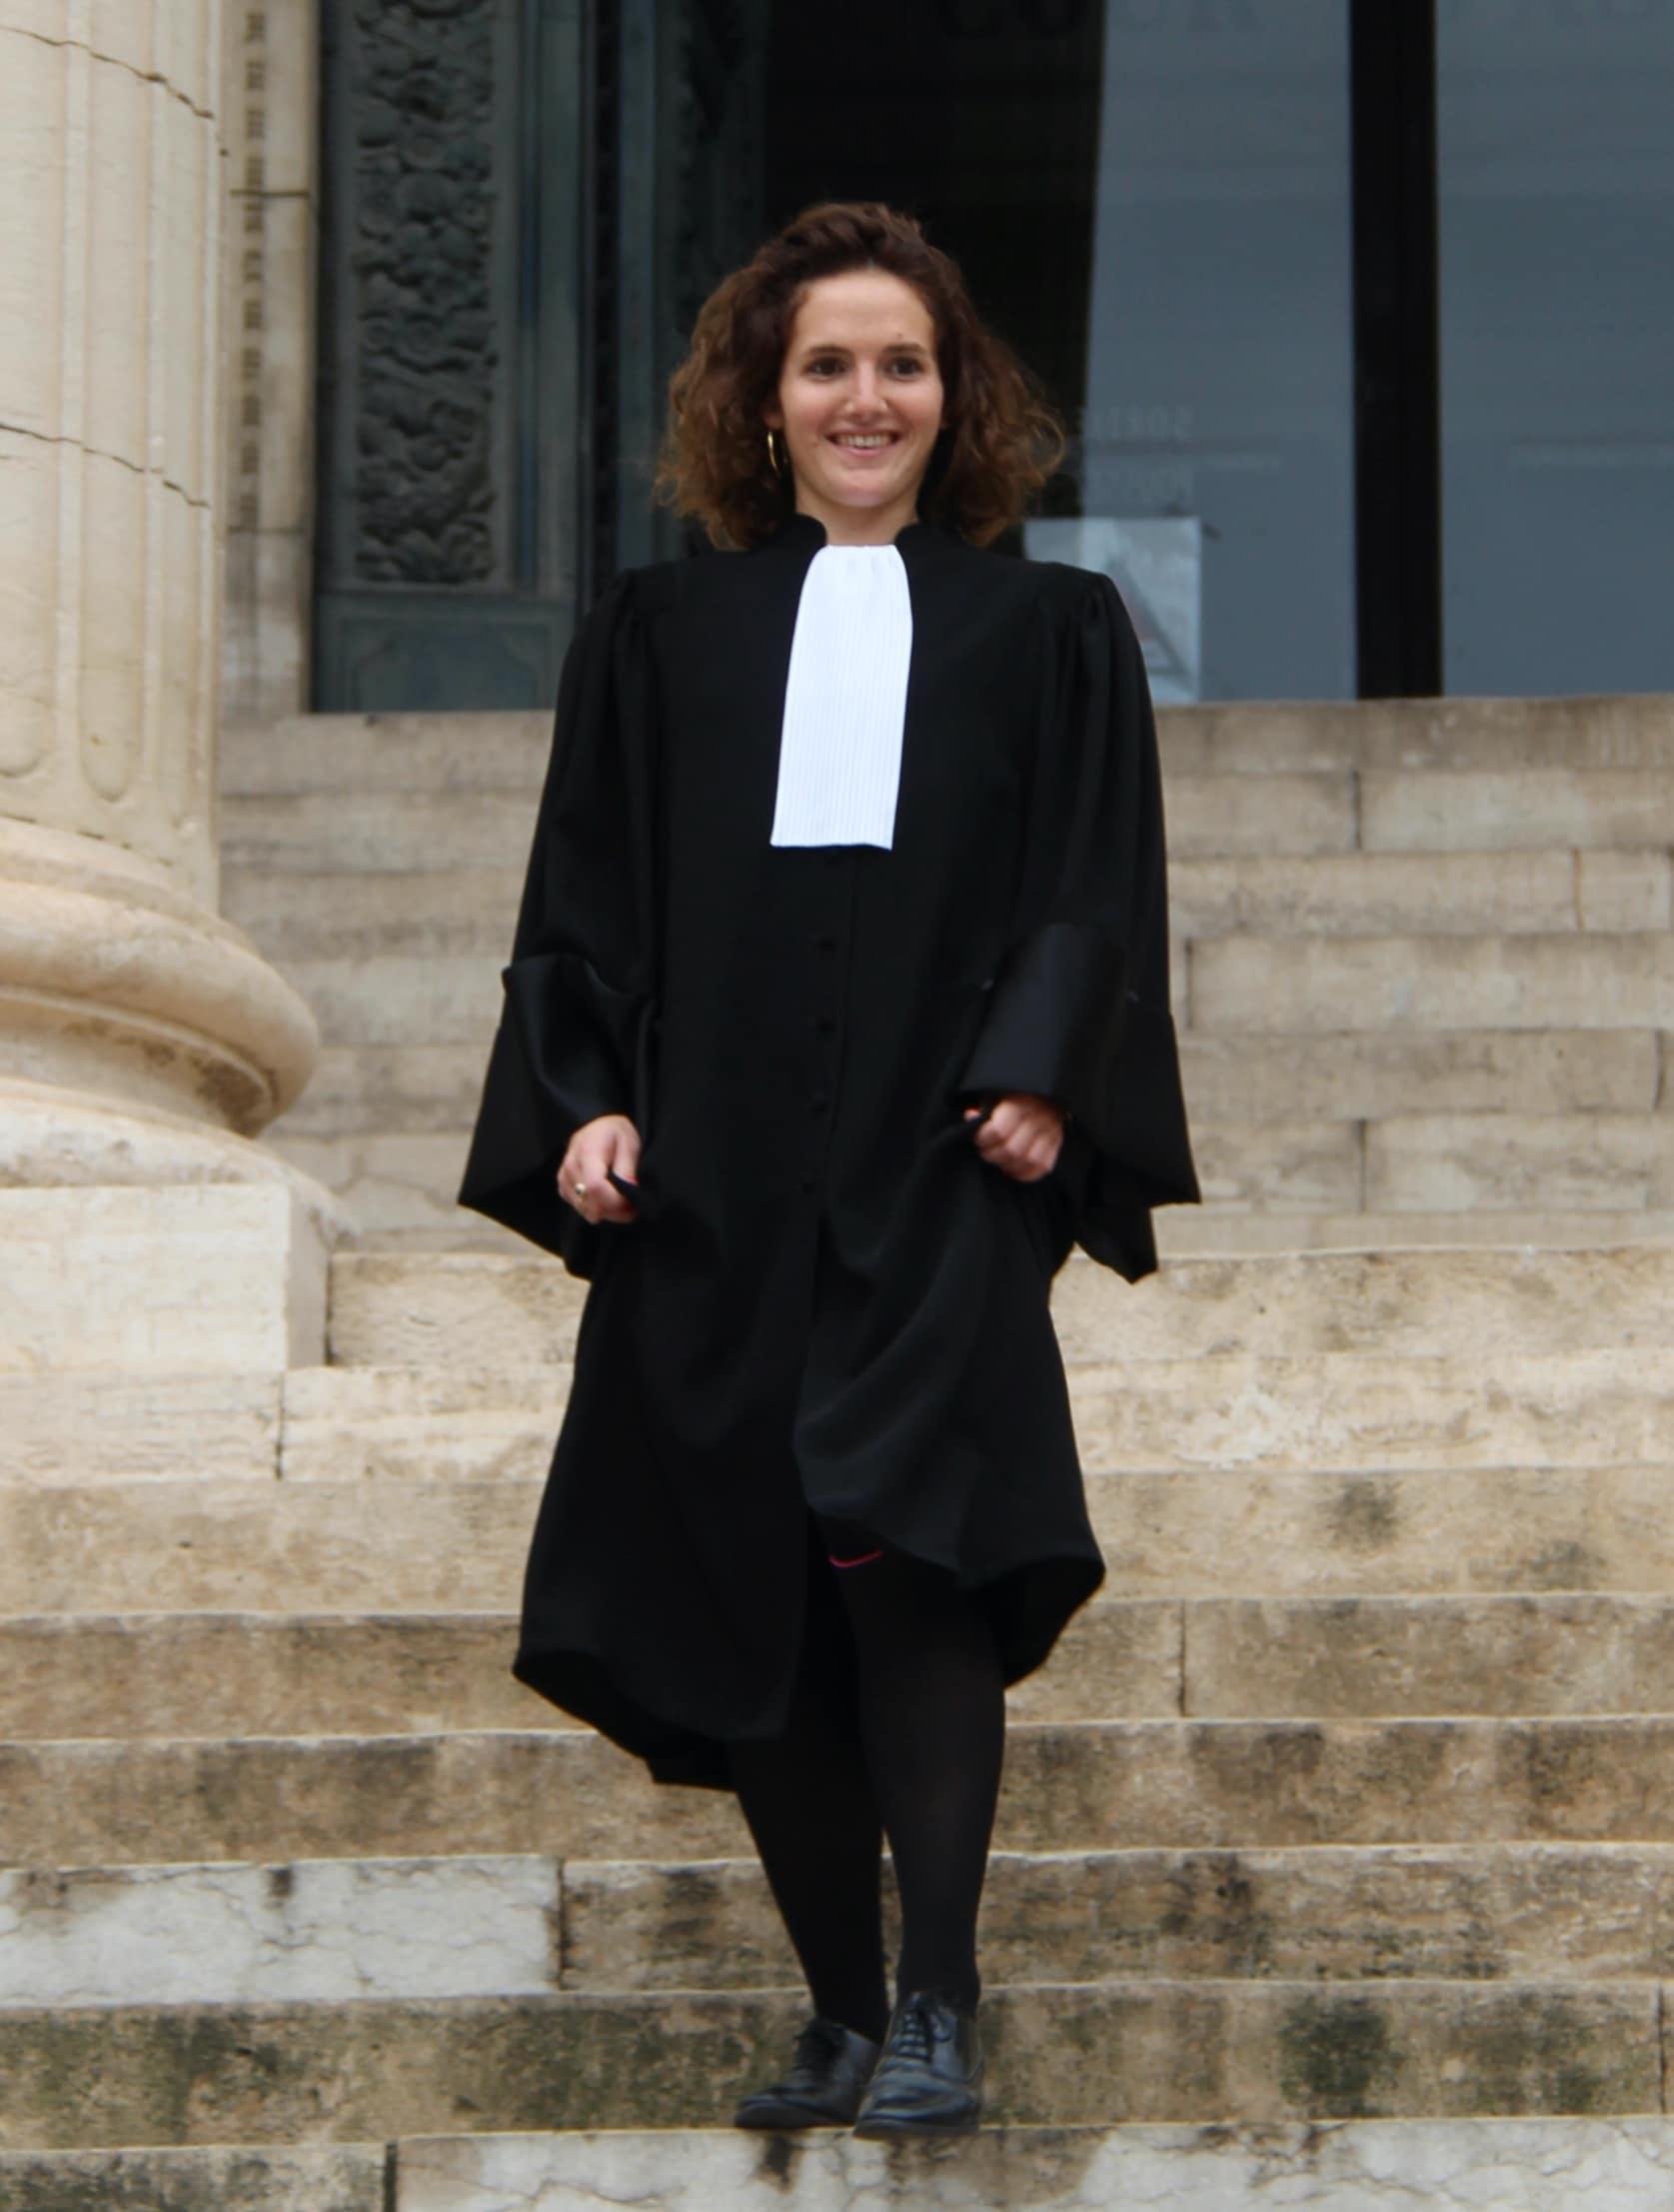 Forum meilleur avocat Montpellier